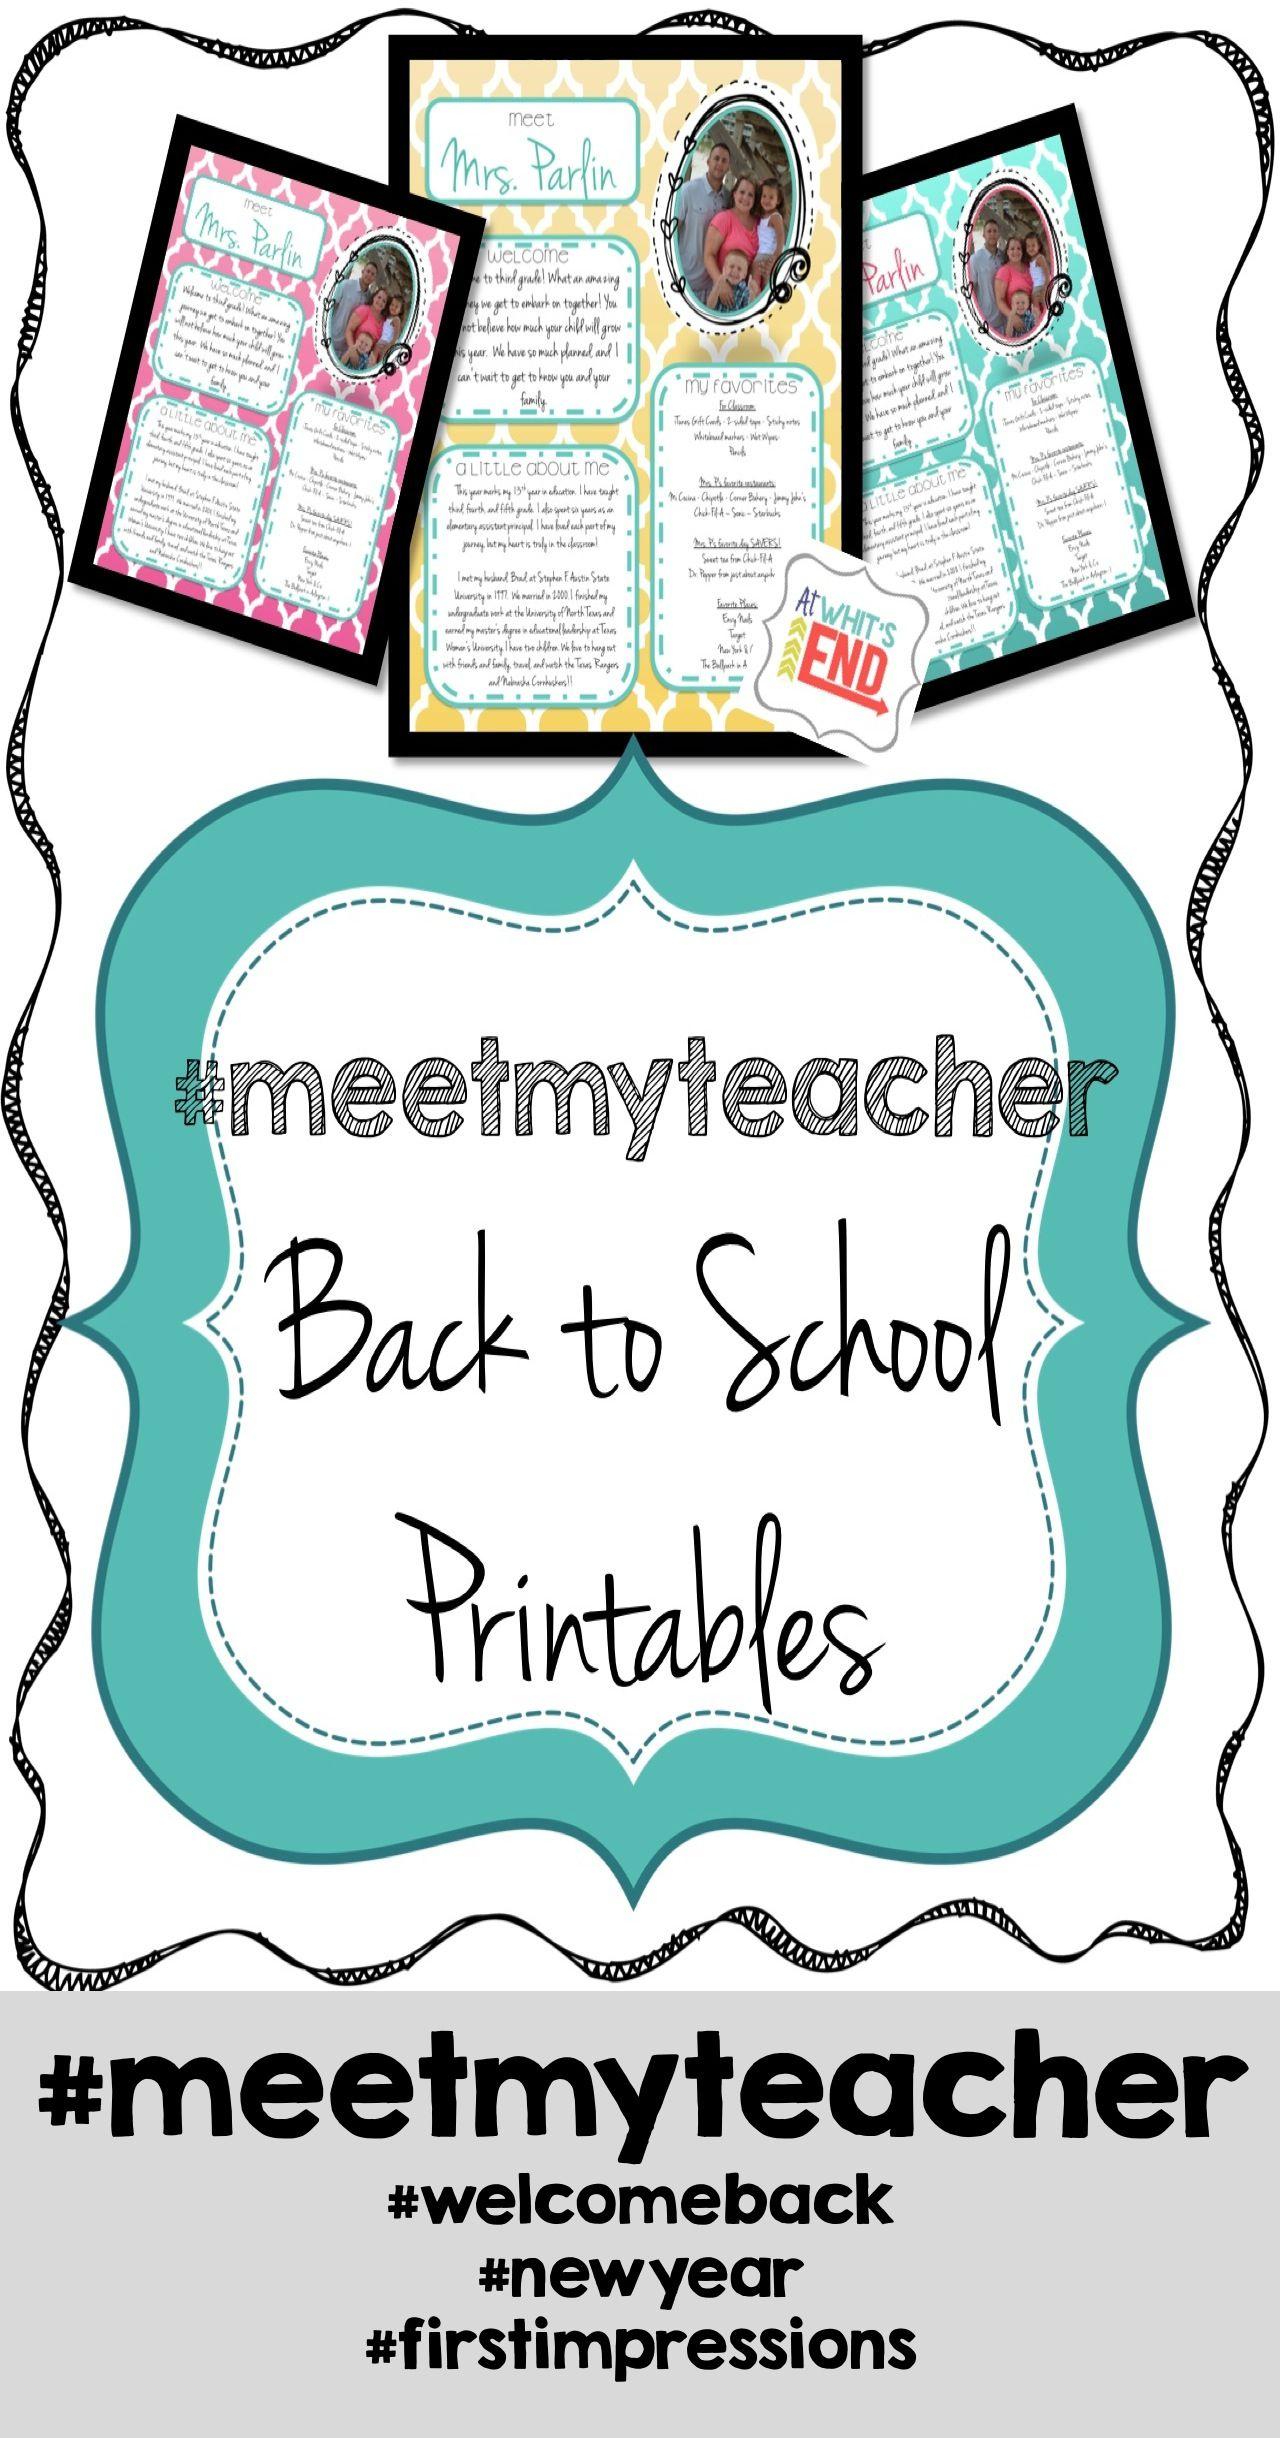 Meet My Teacher All About The Teacher Back To School Printables